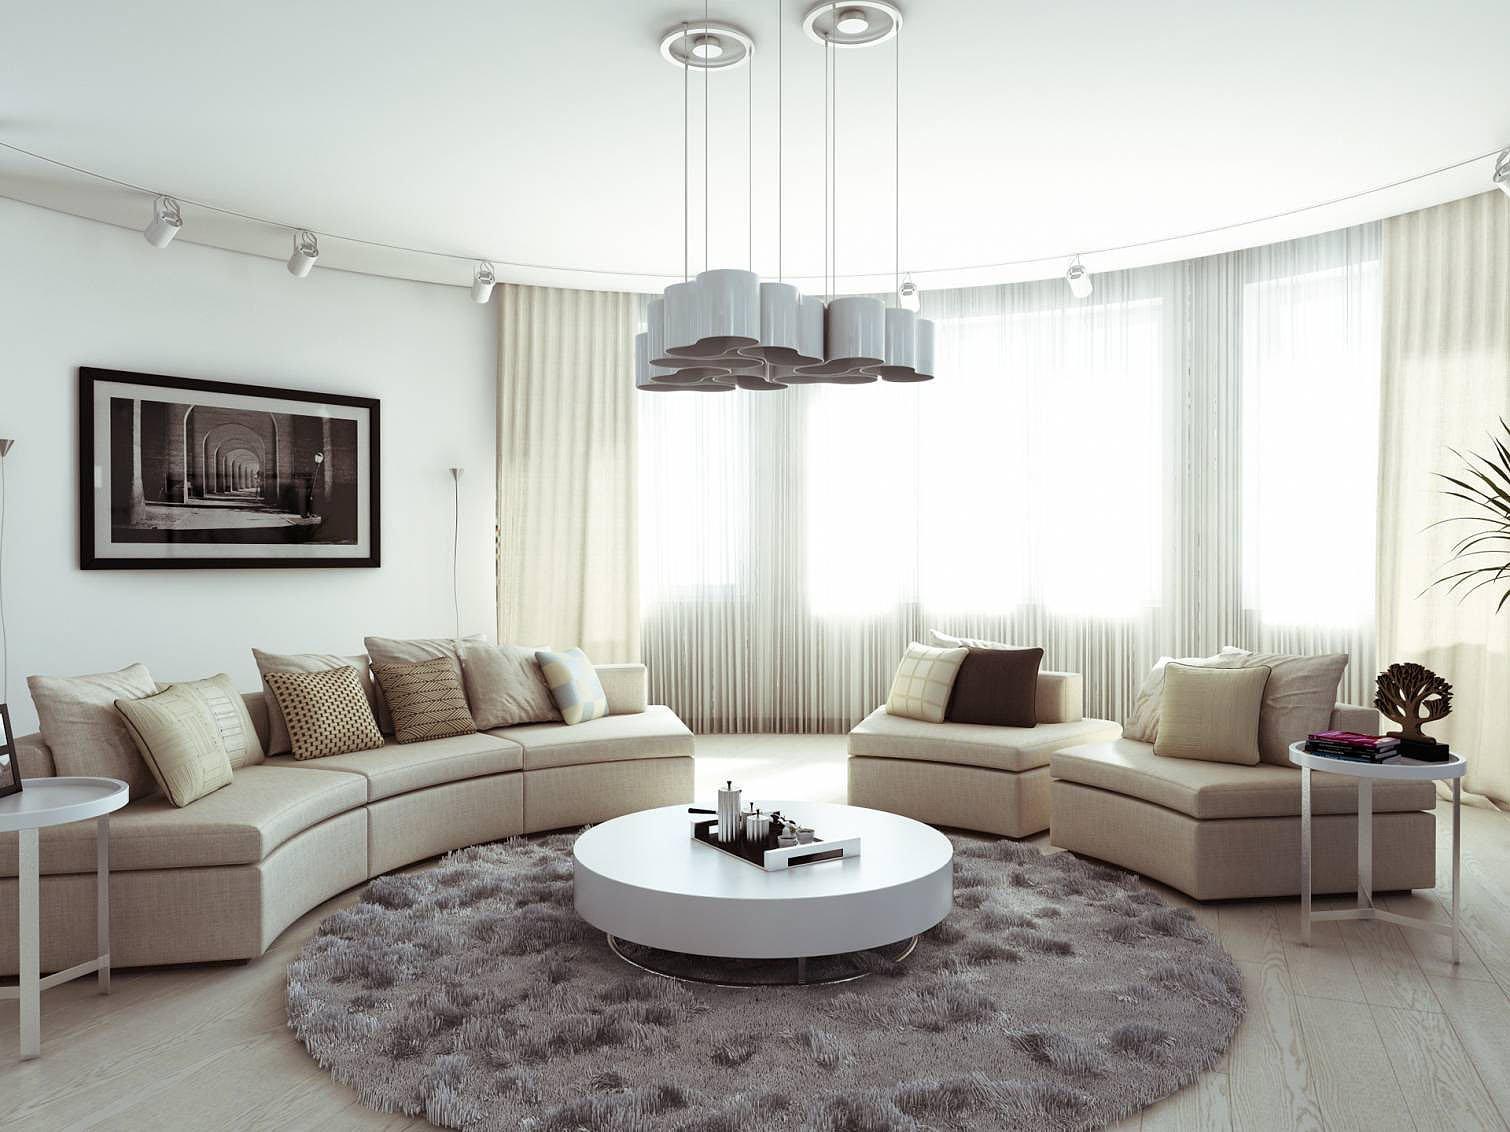 Apartment-Design-in-Moskovyan-Plaza-04